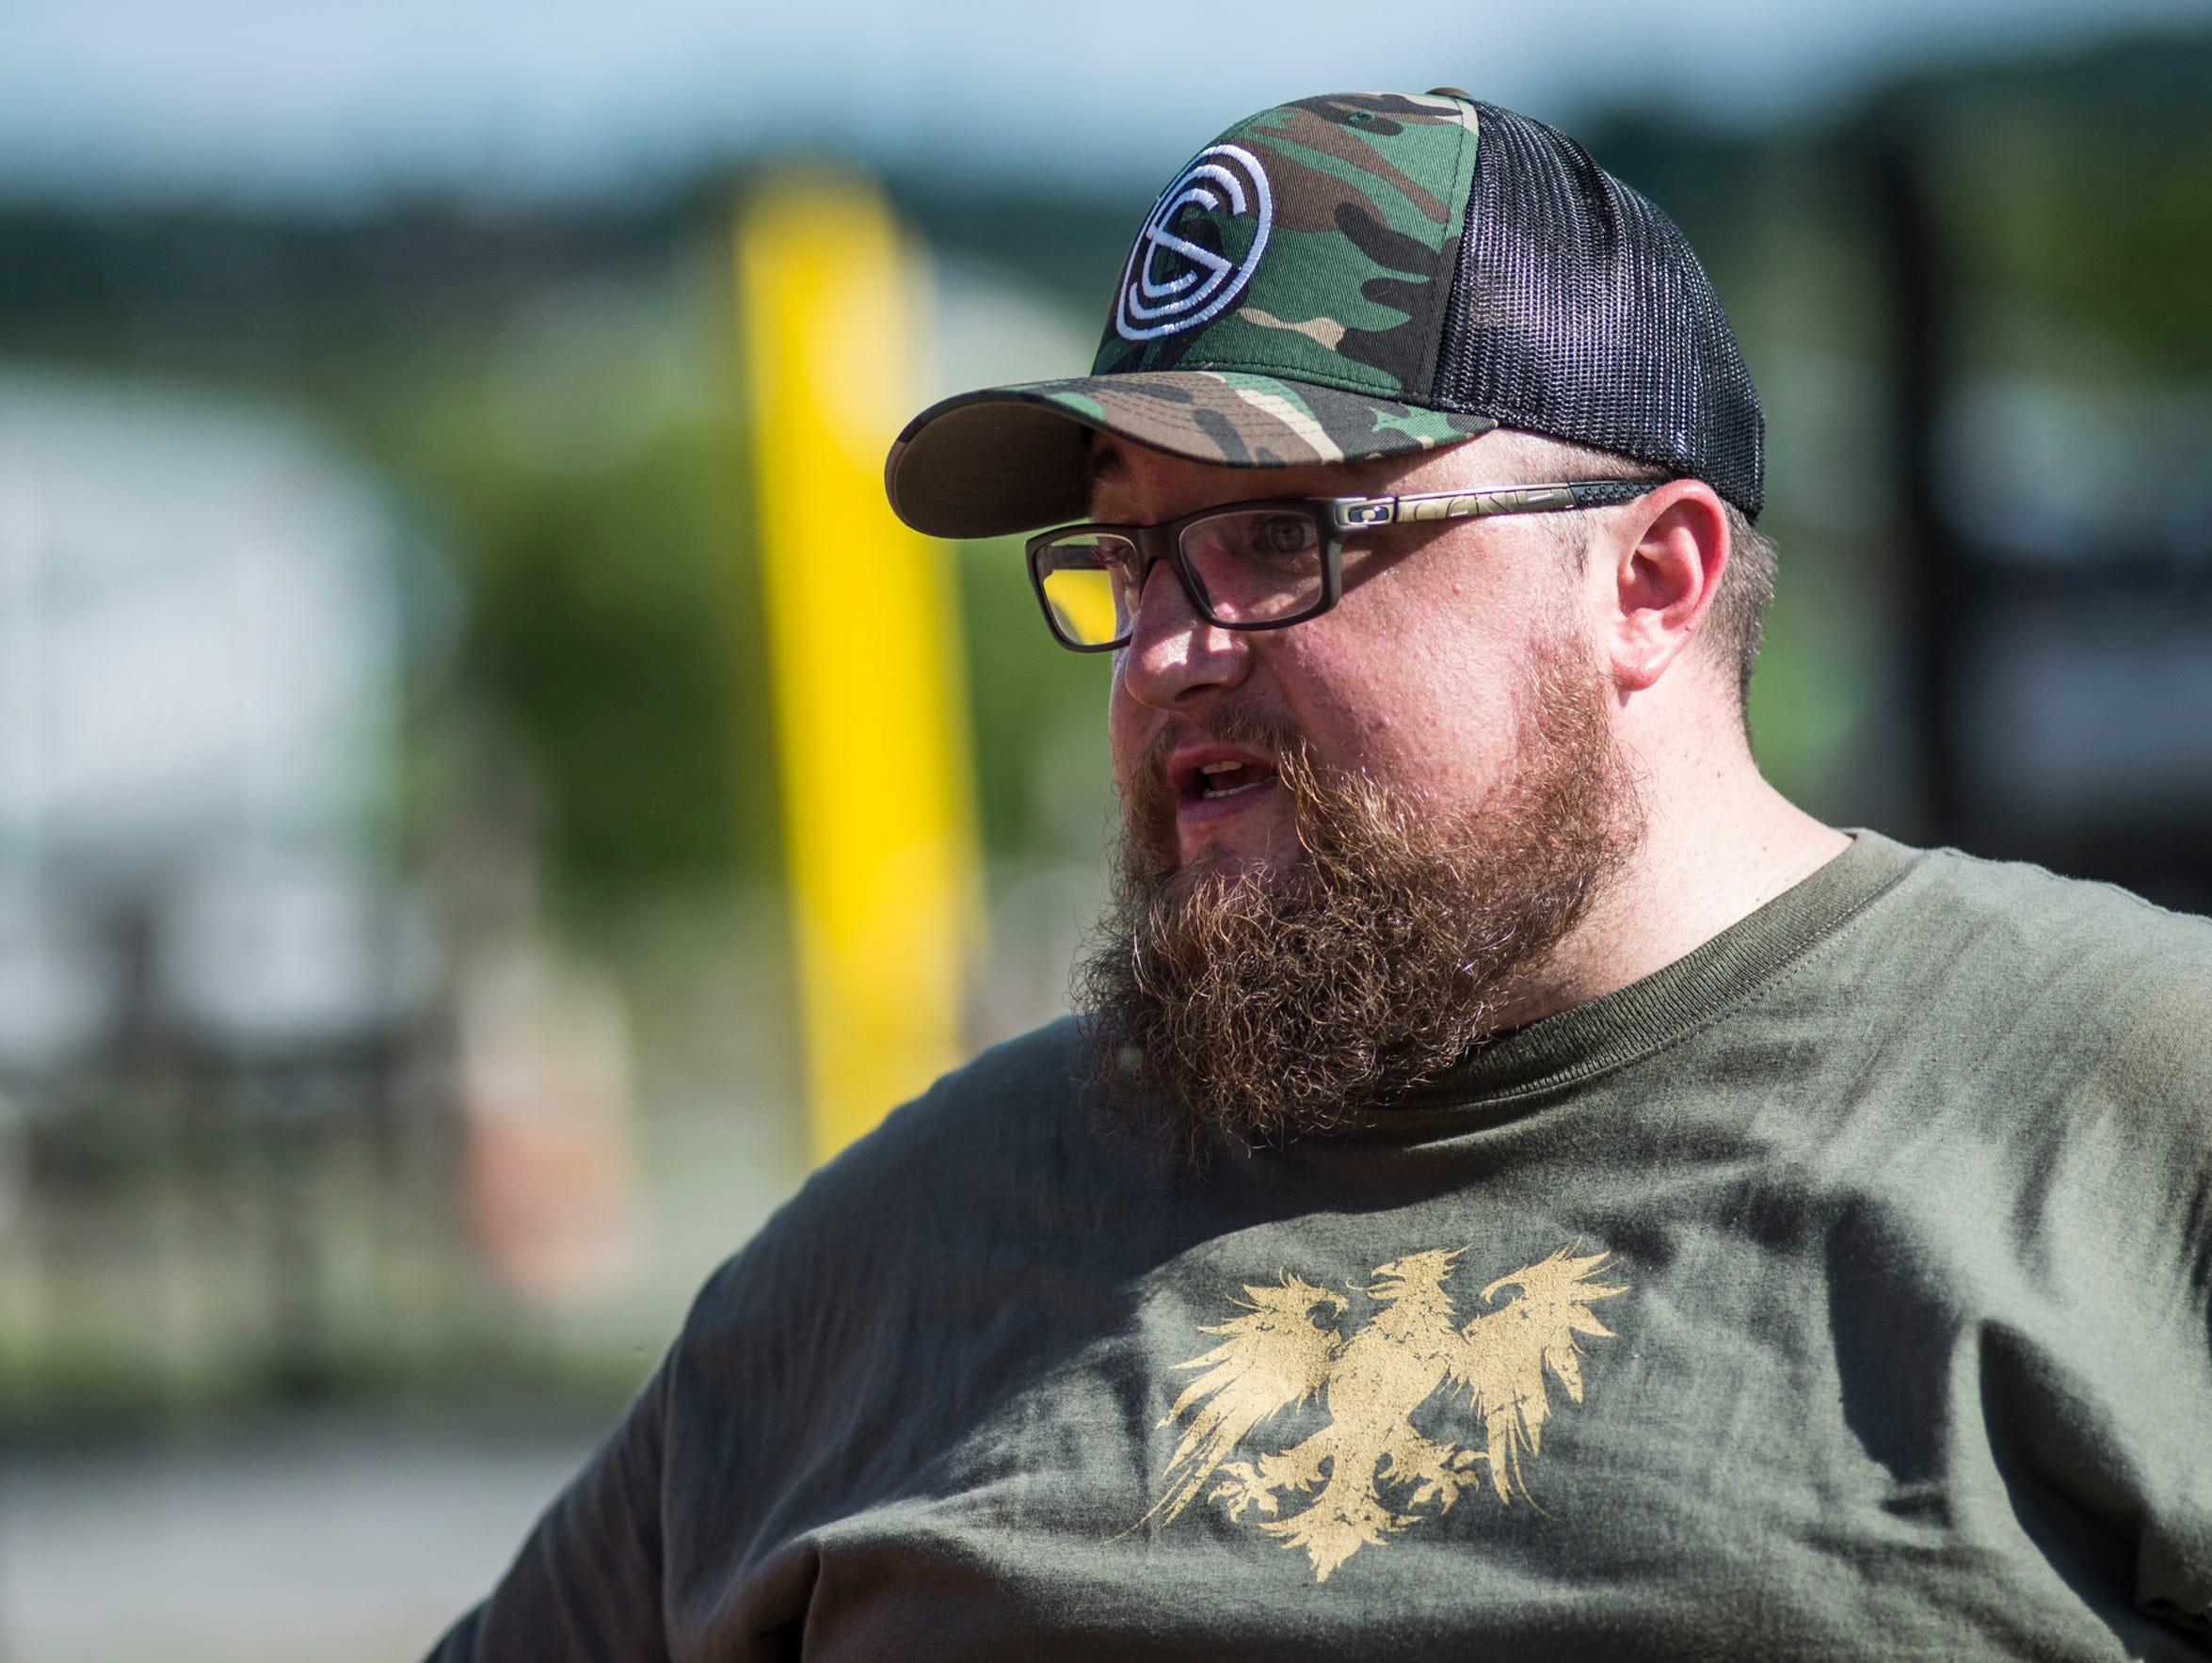 Craig Good, a salesman at Lanco Tactical in Elizabethtown,